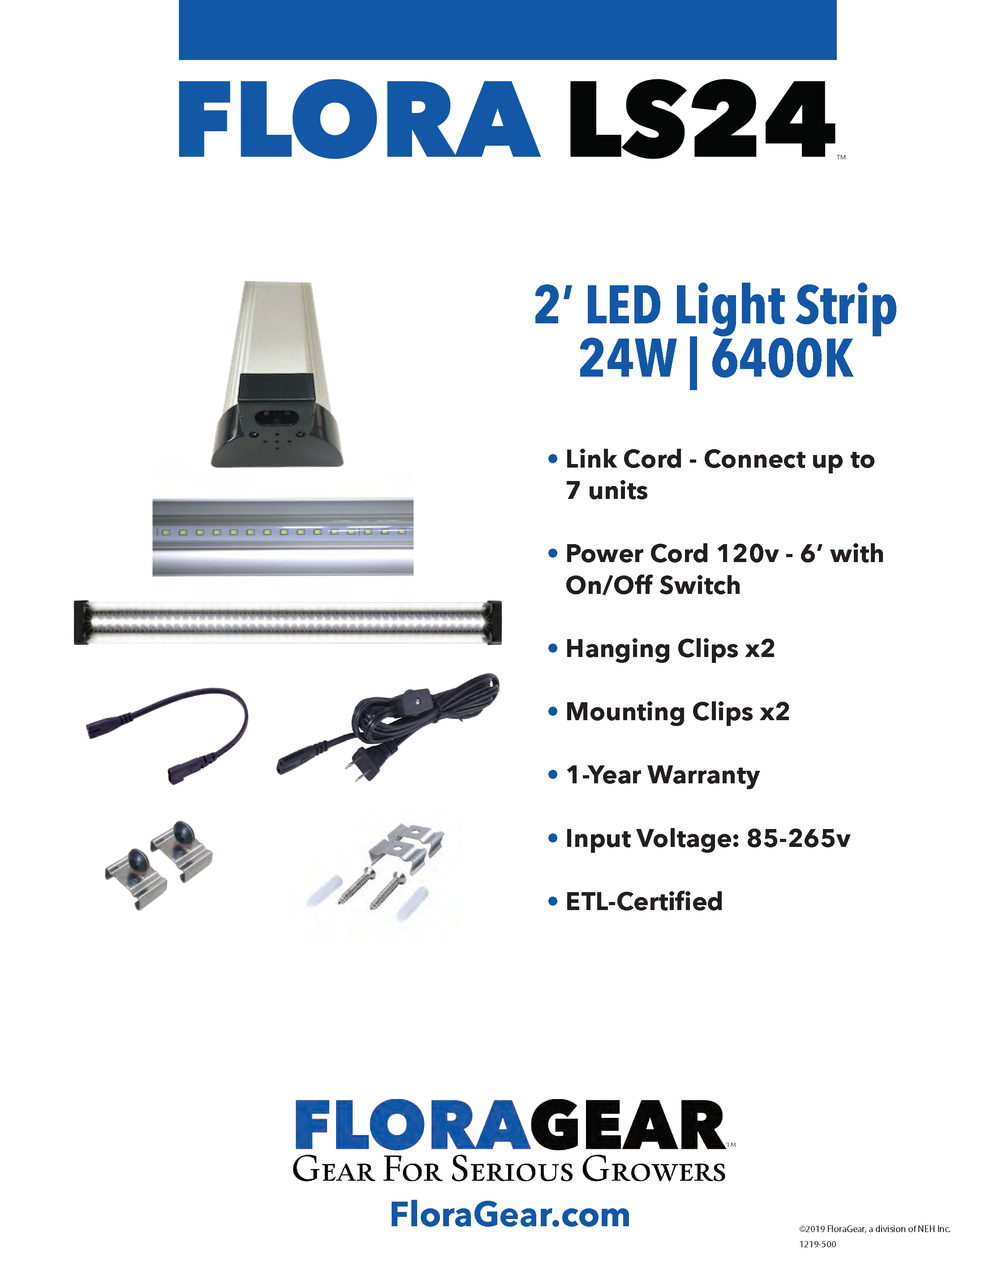 FloraGear Flora LS24 LED Light Strip 6400k 24w - specs